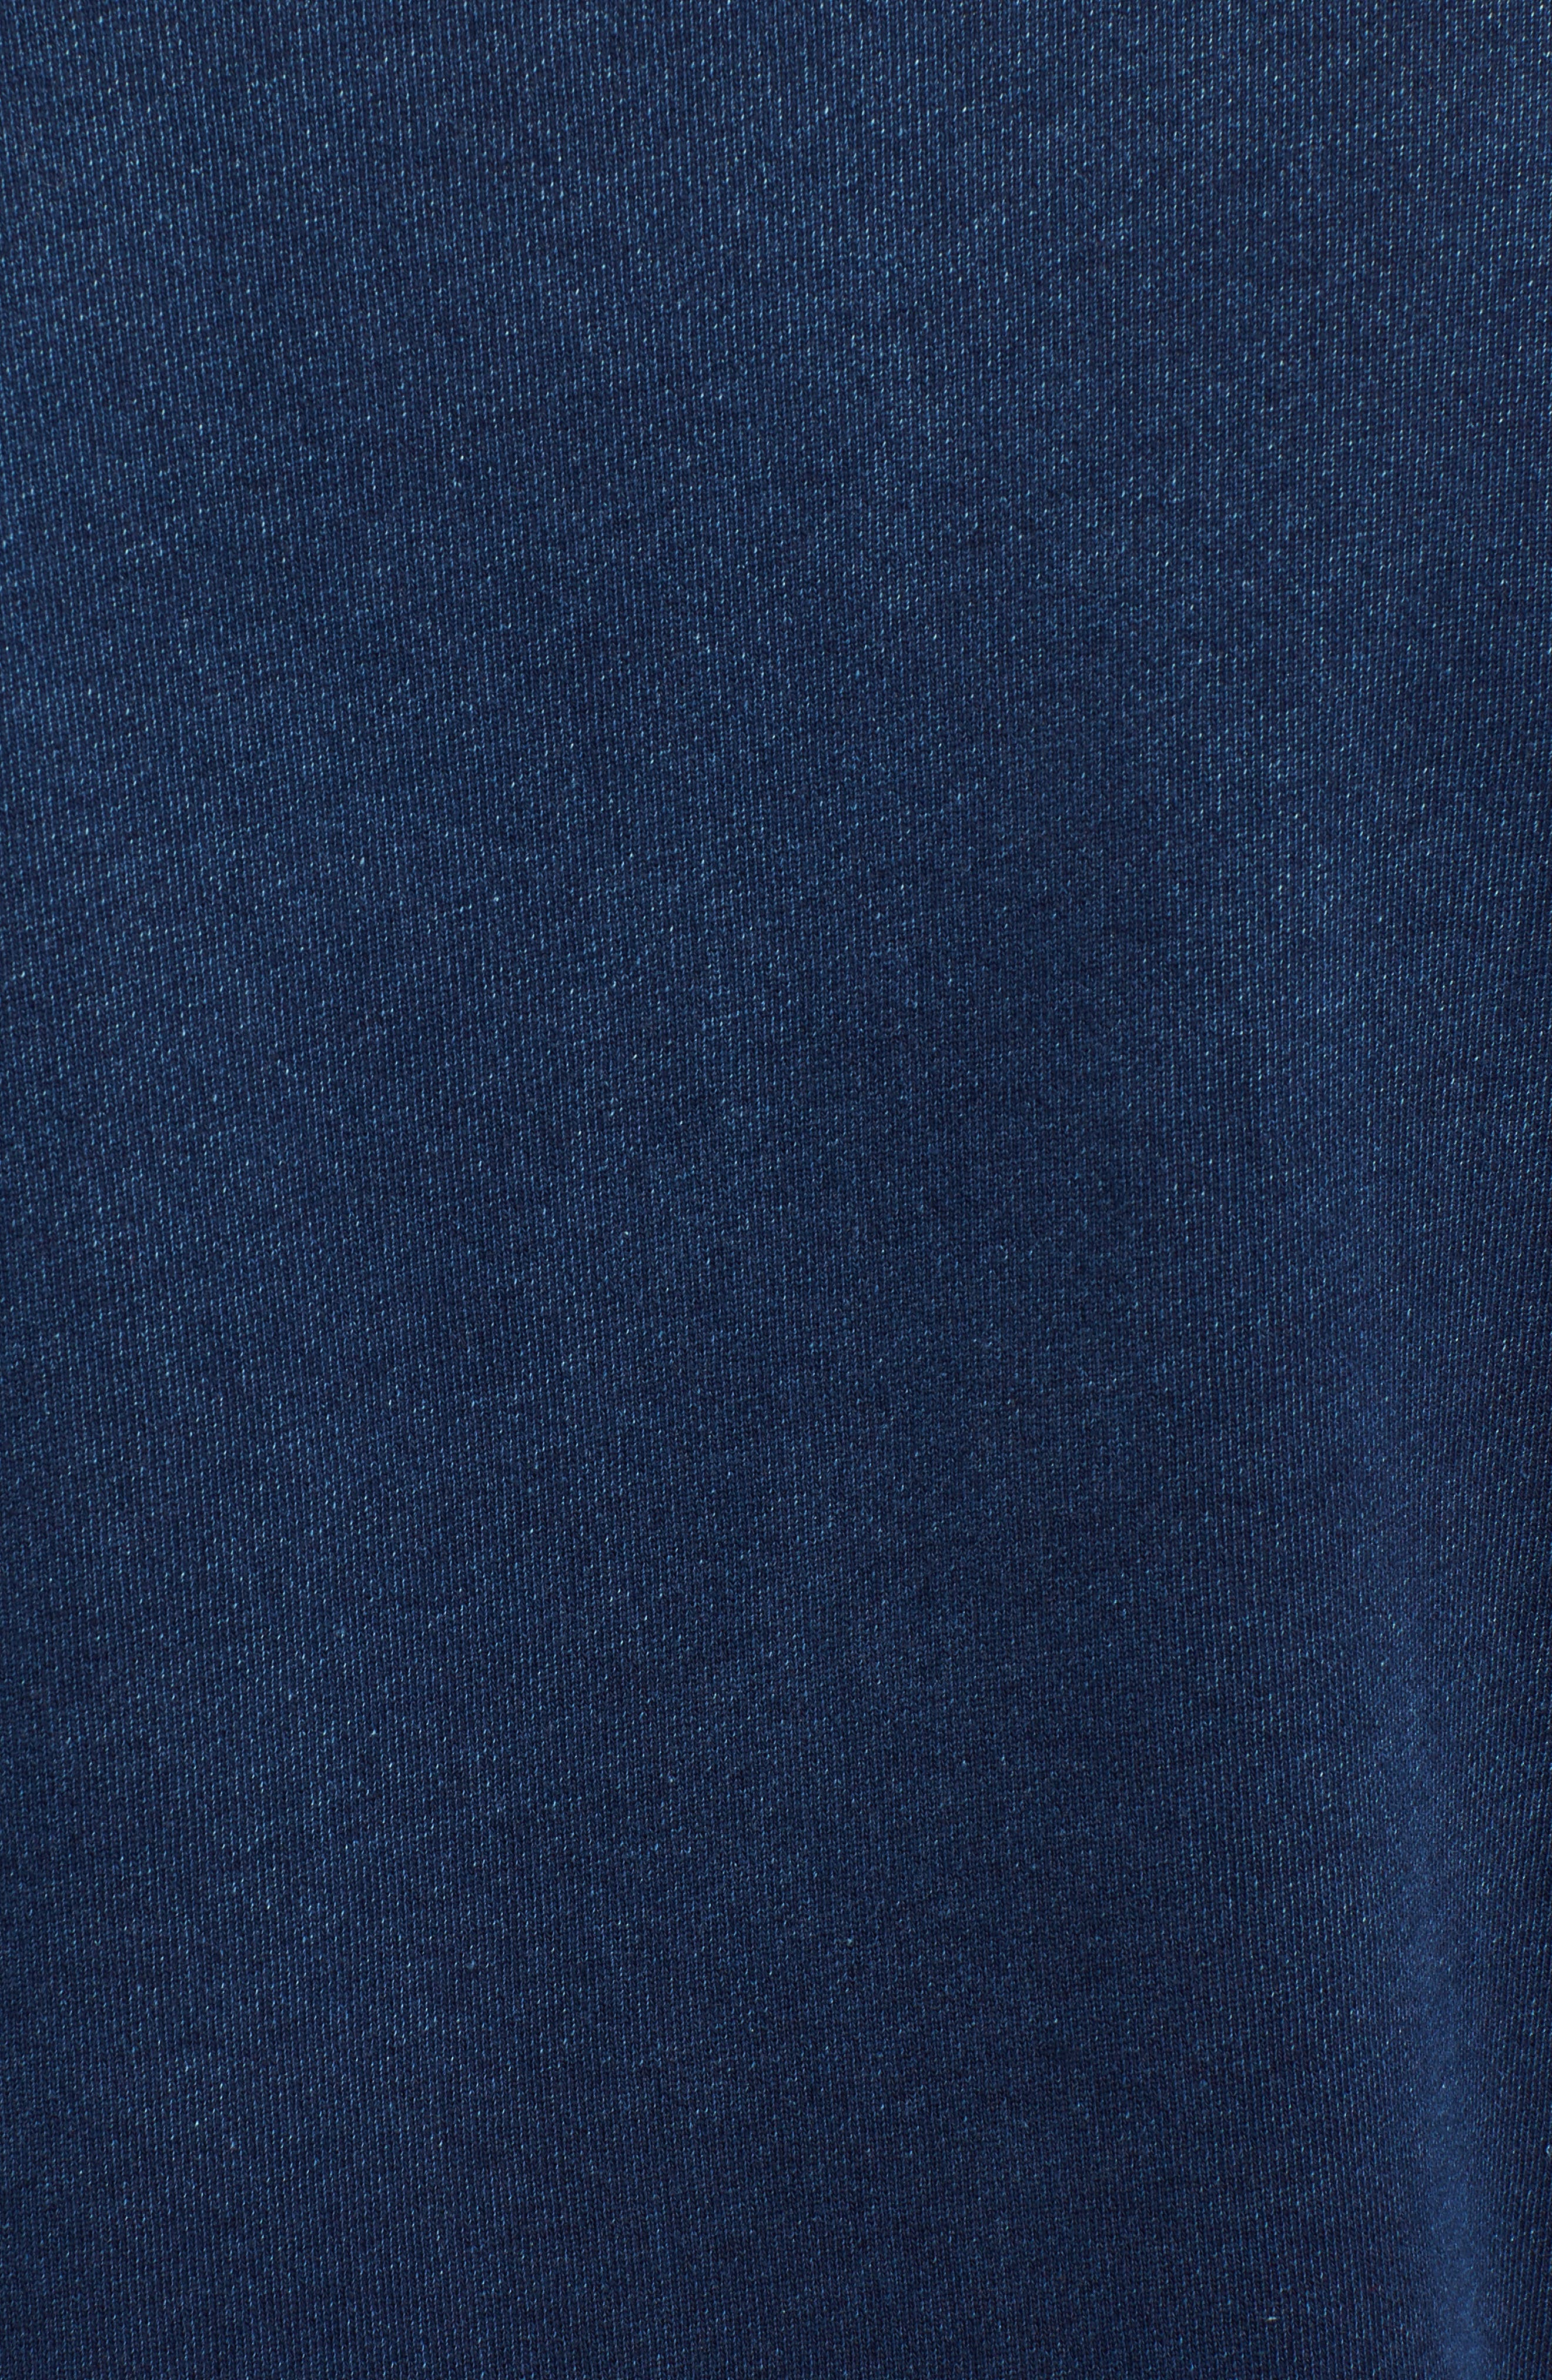 Byron Crewneck Cotton Pocket Sweatshirt,                             Alternate thumbnail 5, color,